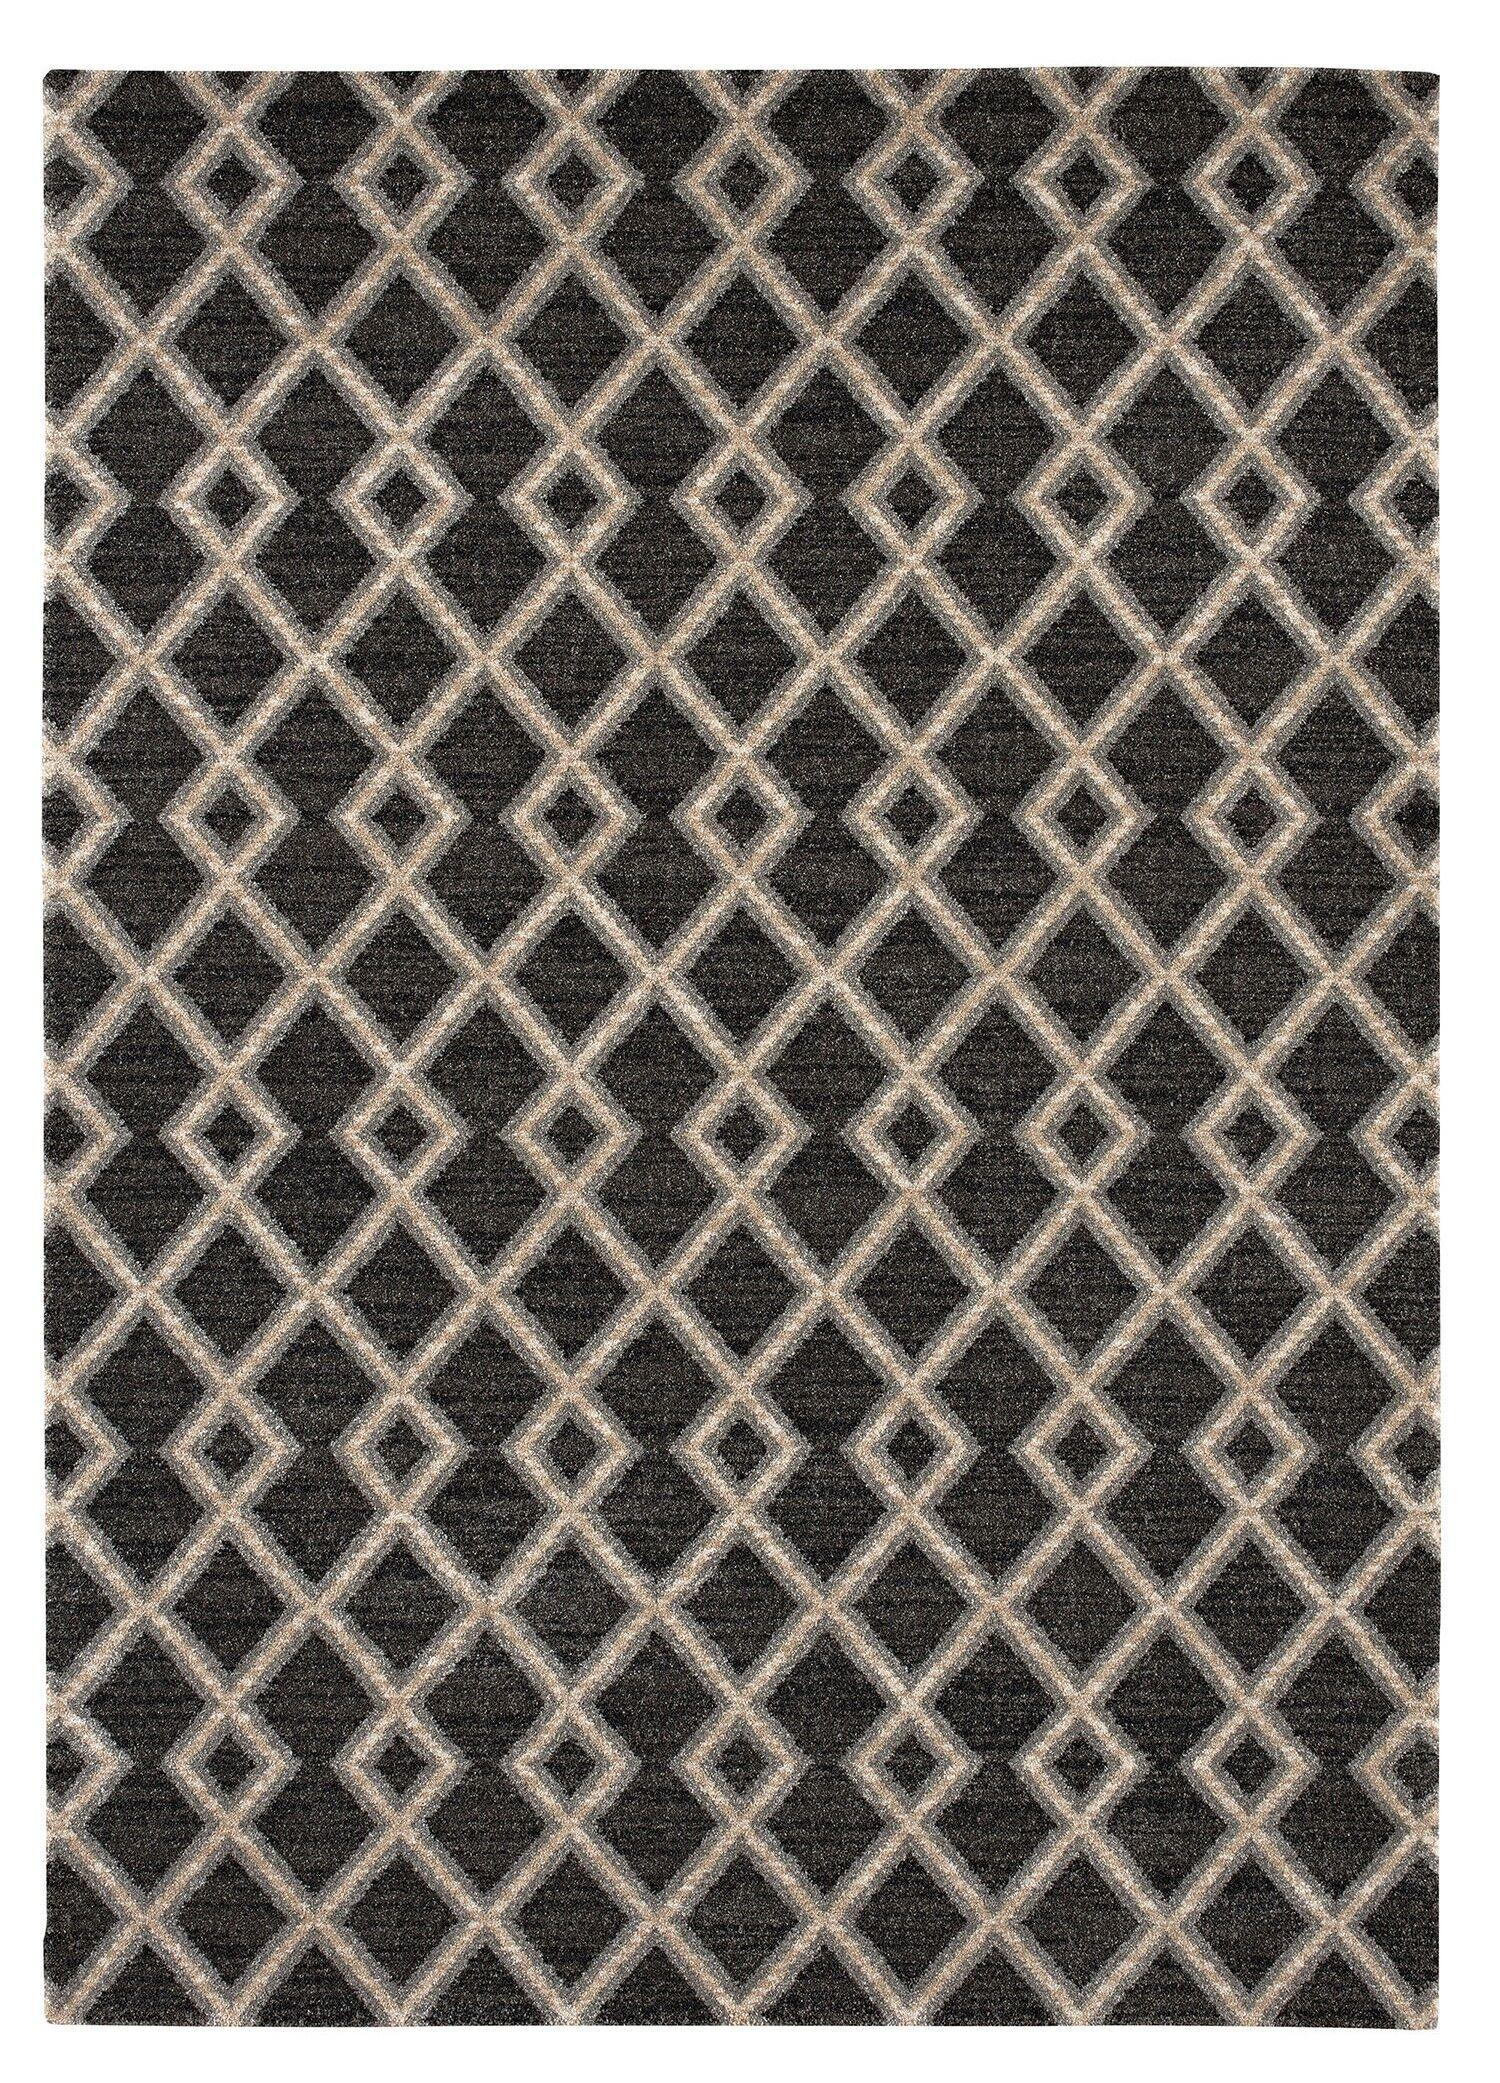 Juhasz Dark Brown Area Rug Rug Size: Rectangle 5'3